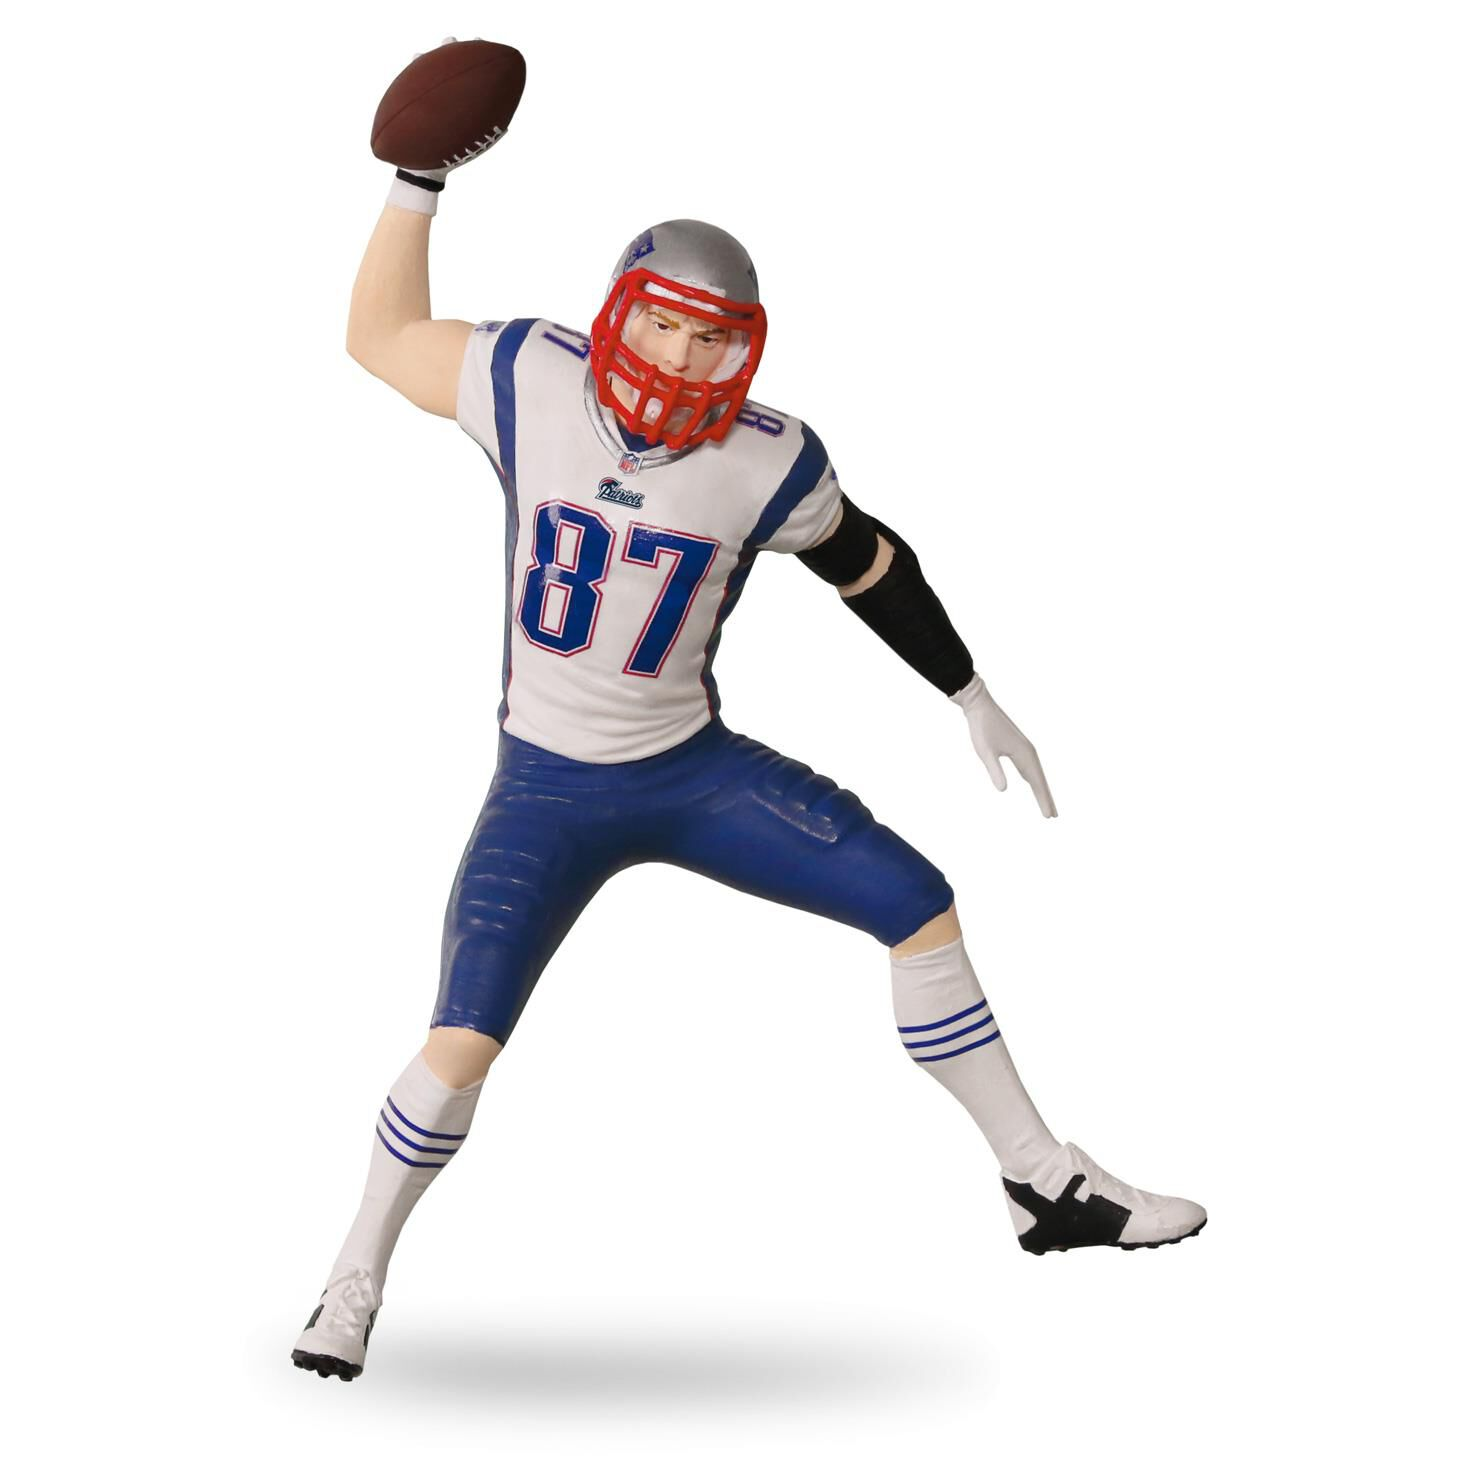 Football player ornament - Rob Gronkowski New England Patriots Football Legends Ornament Keepsake Ornaments Hallmark